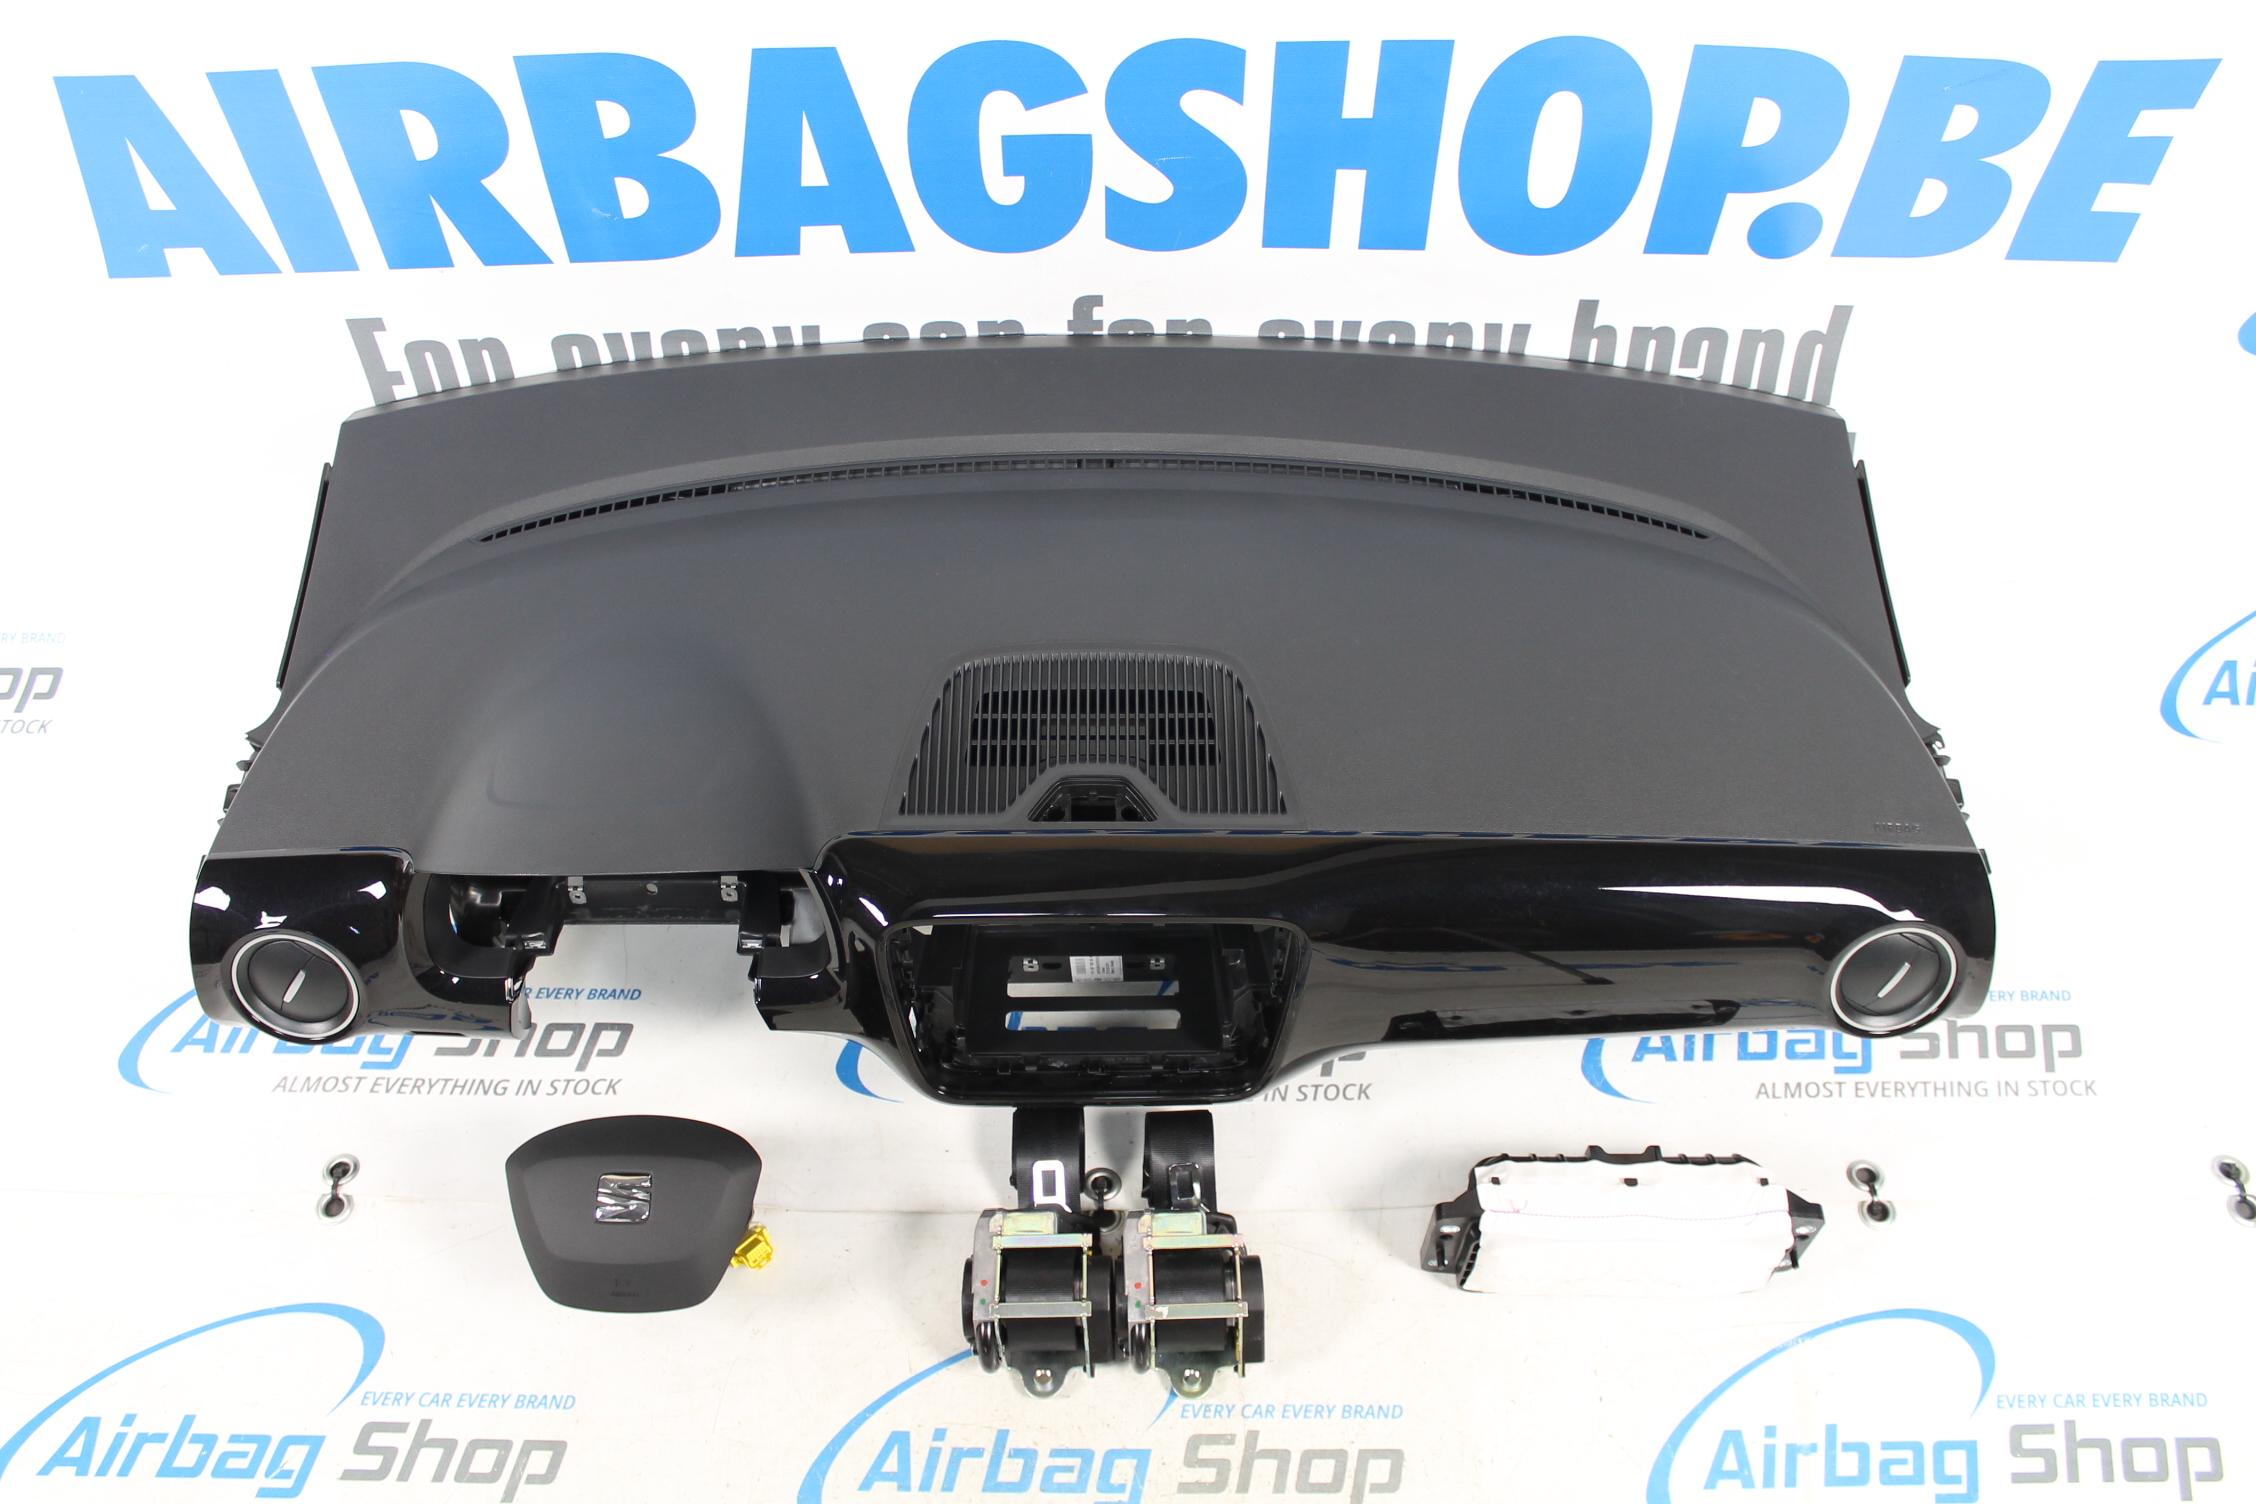 airbag kit cruscotto seat mii facelift 2016 airbag shop. Black Bedroom Furniture Sets. Home Design Ideas